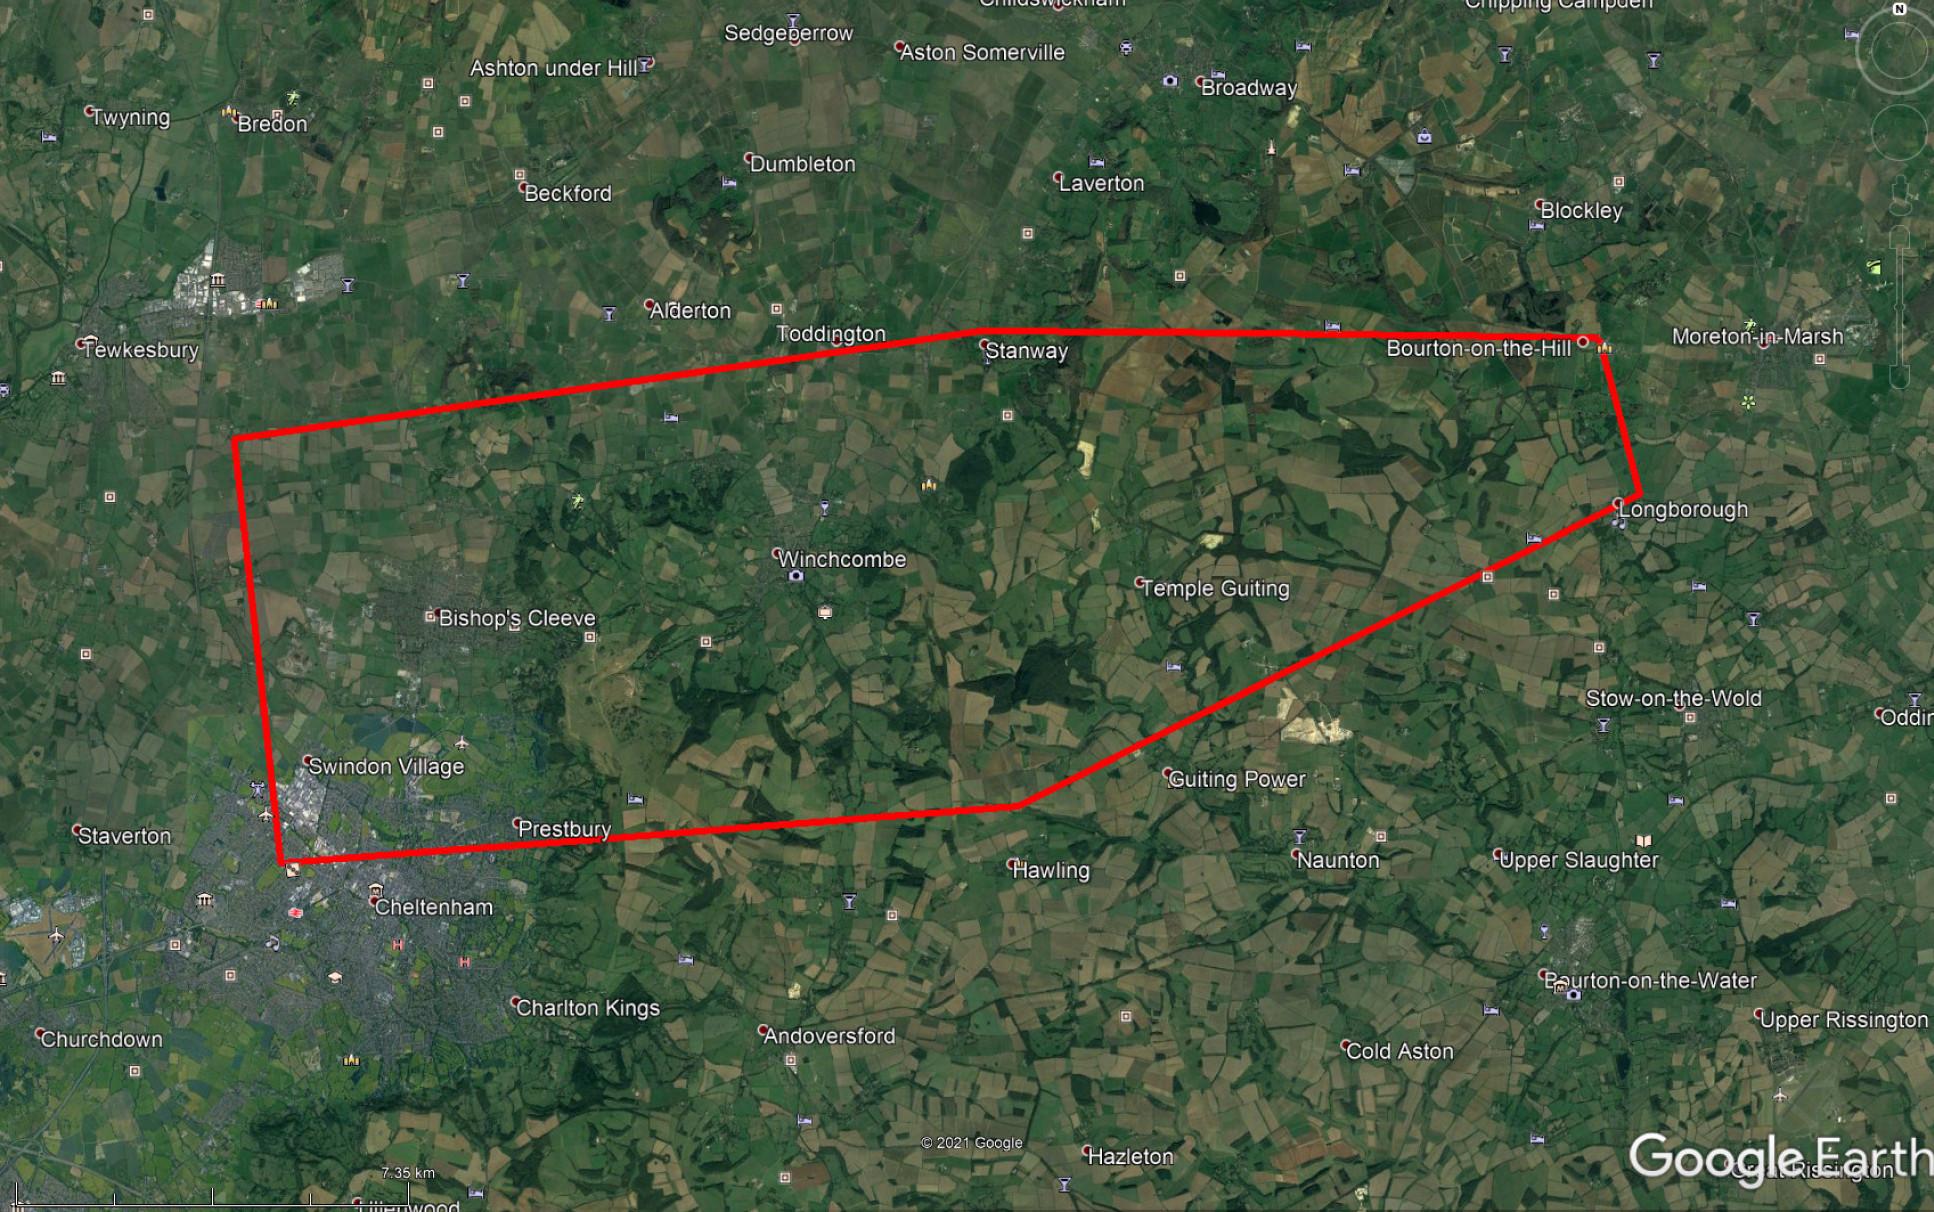 Map of preliminary location of strewn debris